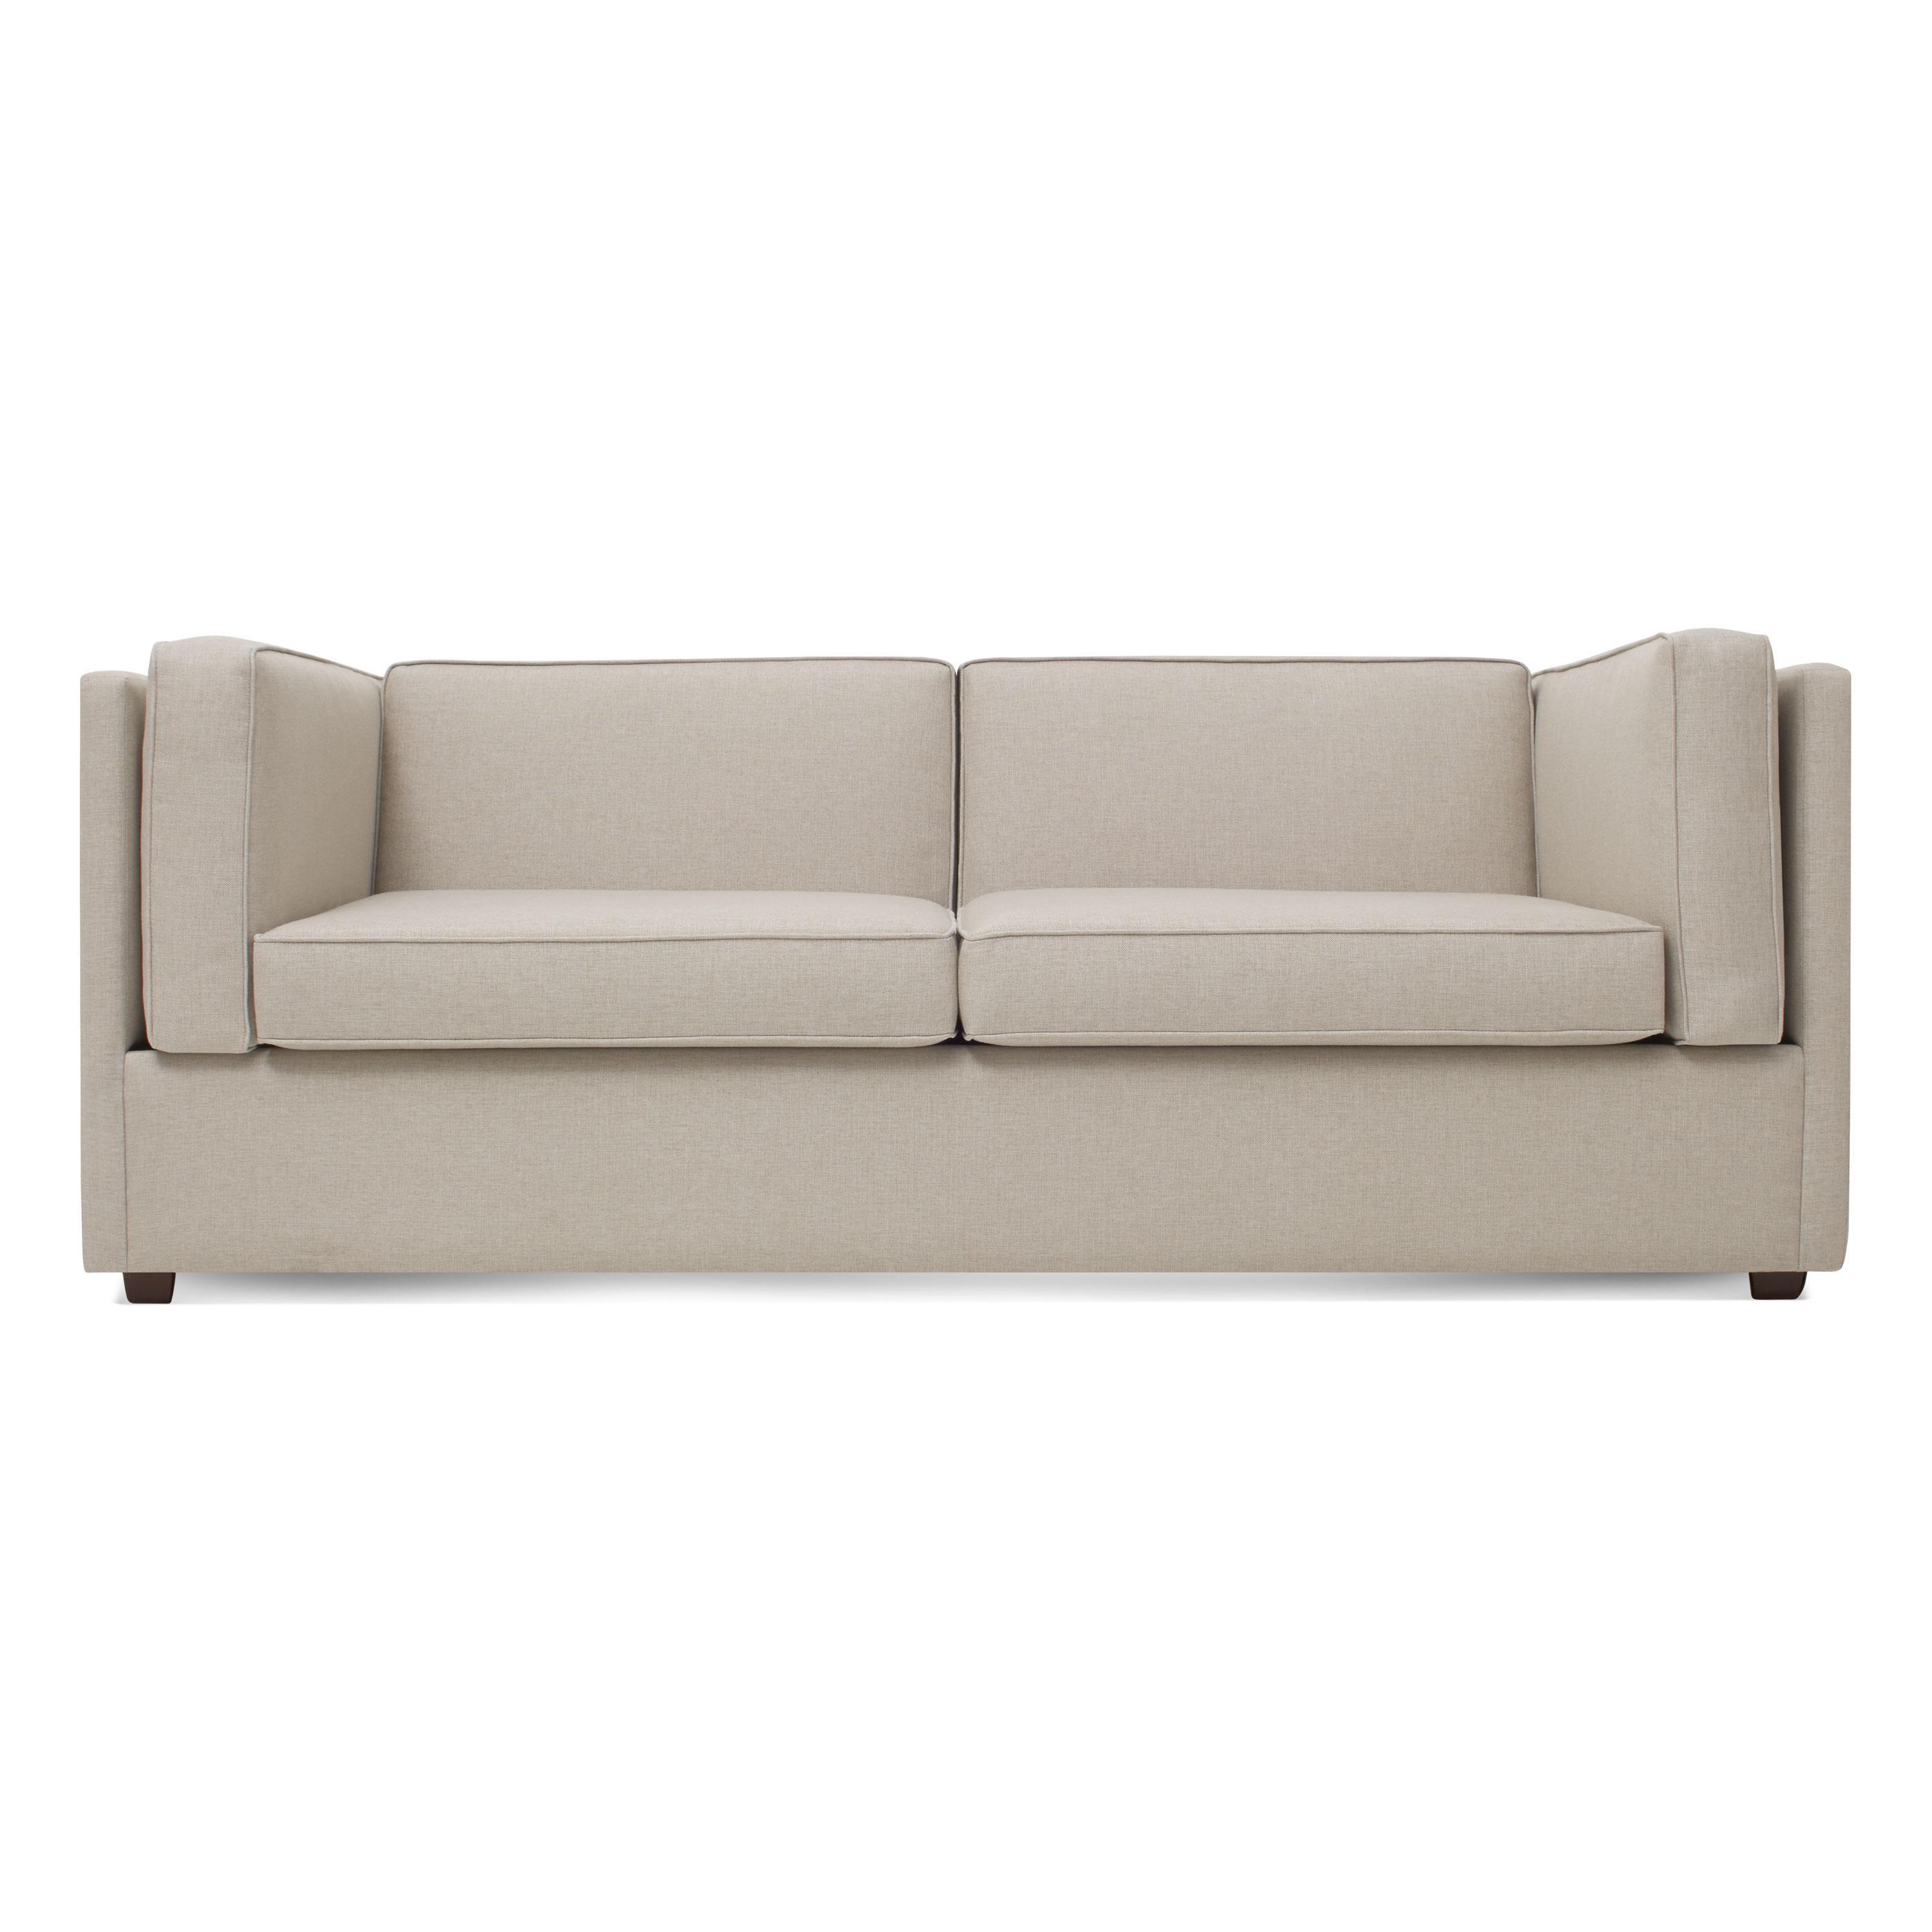 Bank Sleeper Sofa – Deep Seat Sofa Beds   Blu Dot Within Blu Dot Sofas (Image 4 of 20)